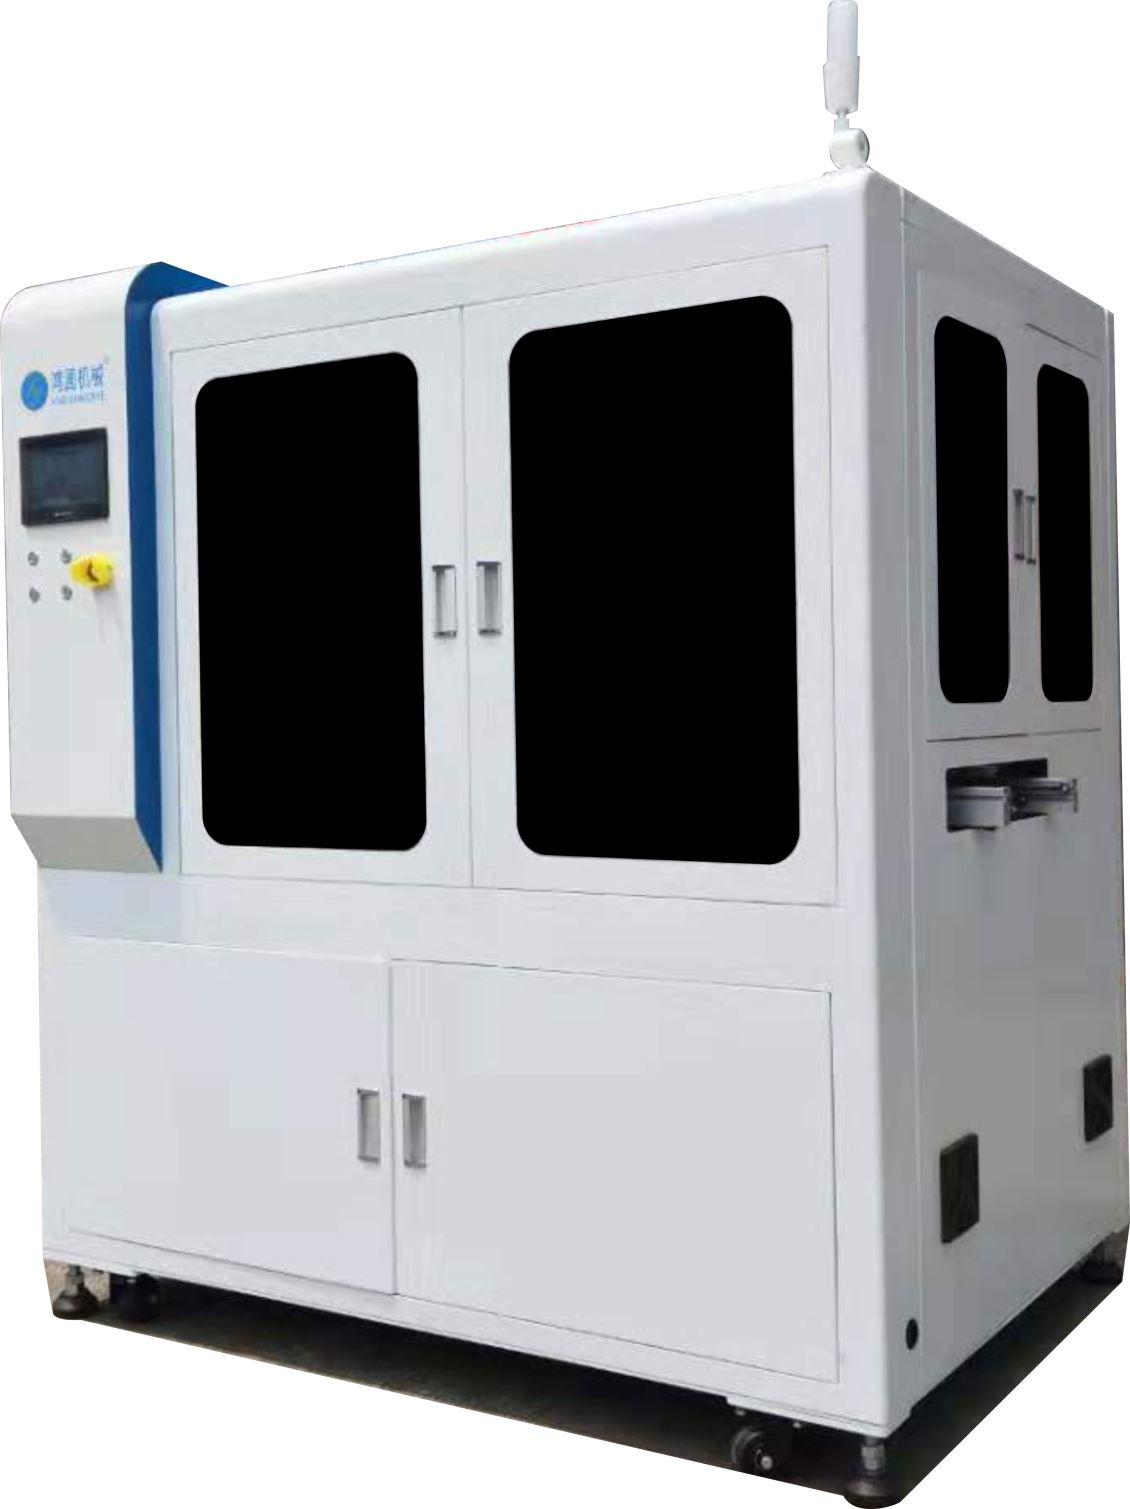 SMT贴片机,全自动贴标机,SMT生产线,视觉点胶机,无铅波峰焊